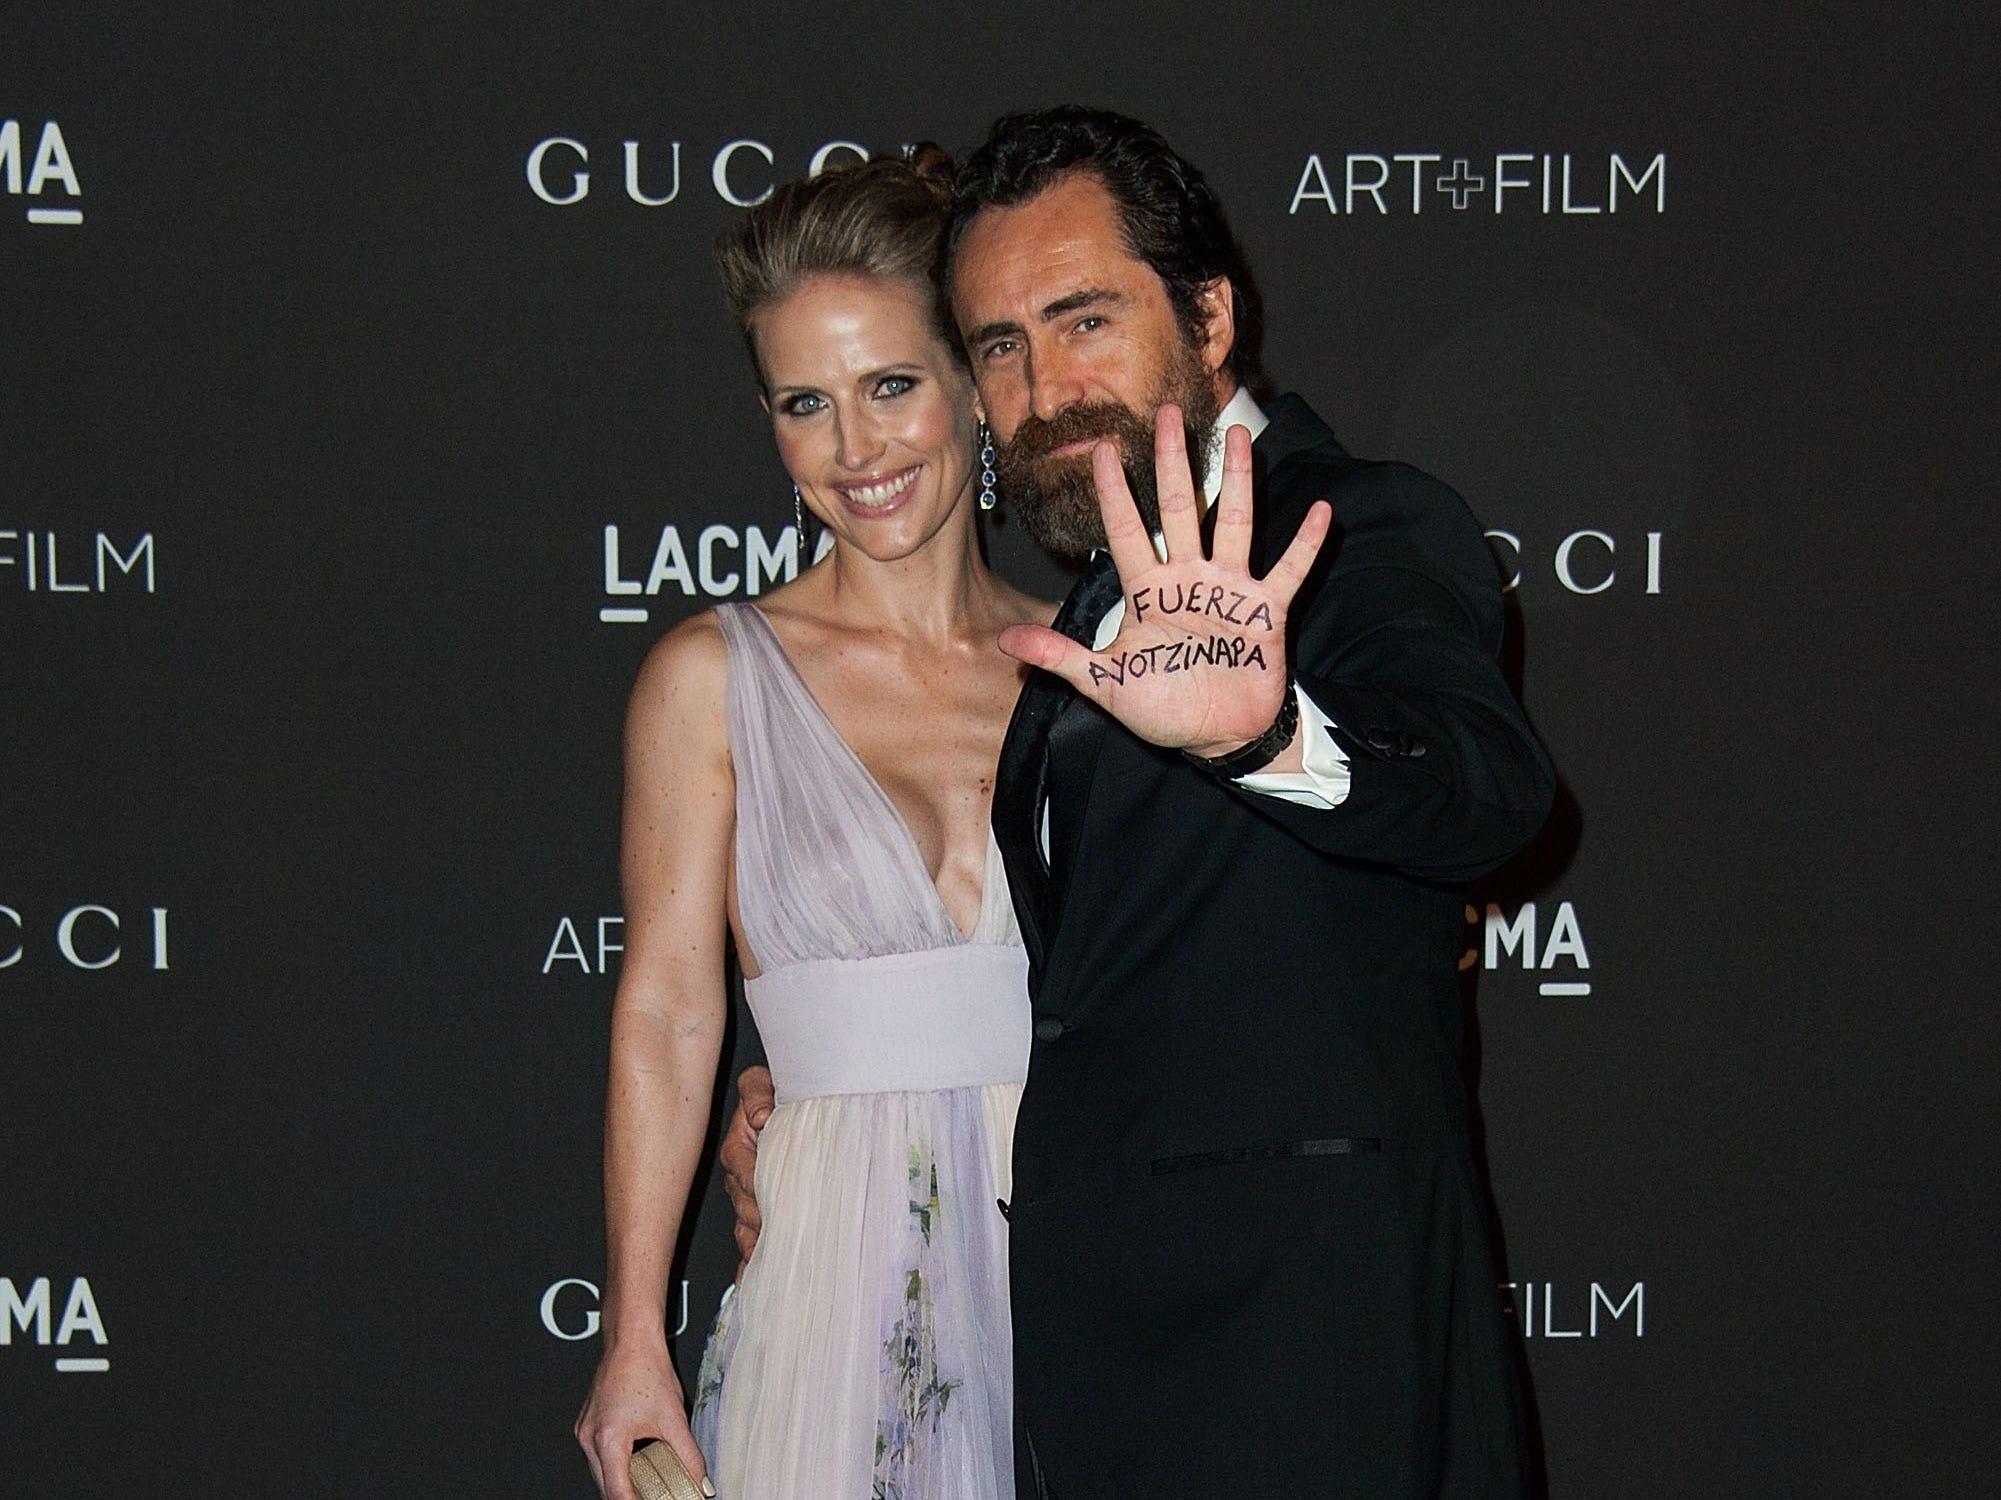 Demian Bichir and Stefanie Sherk attend the 2014 LACMA Art + Film Gala  on Nov. 1, 2014, in Los Angeles, California.